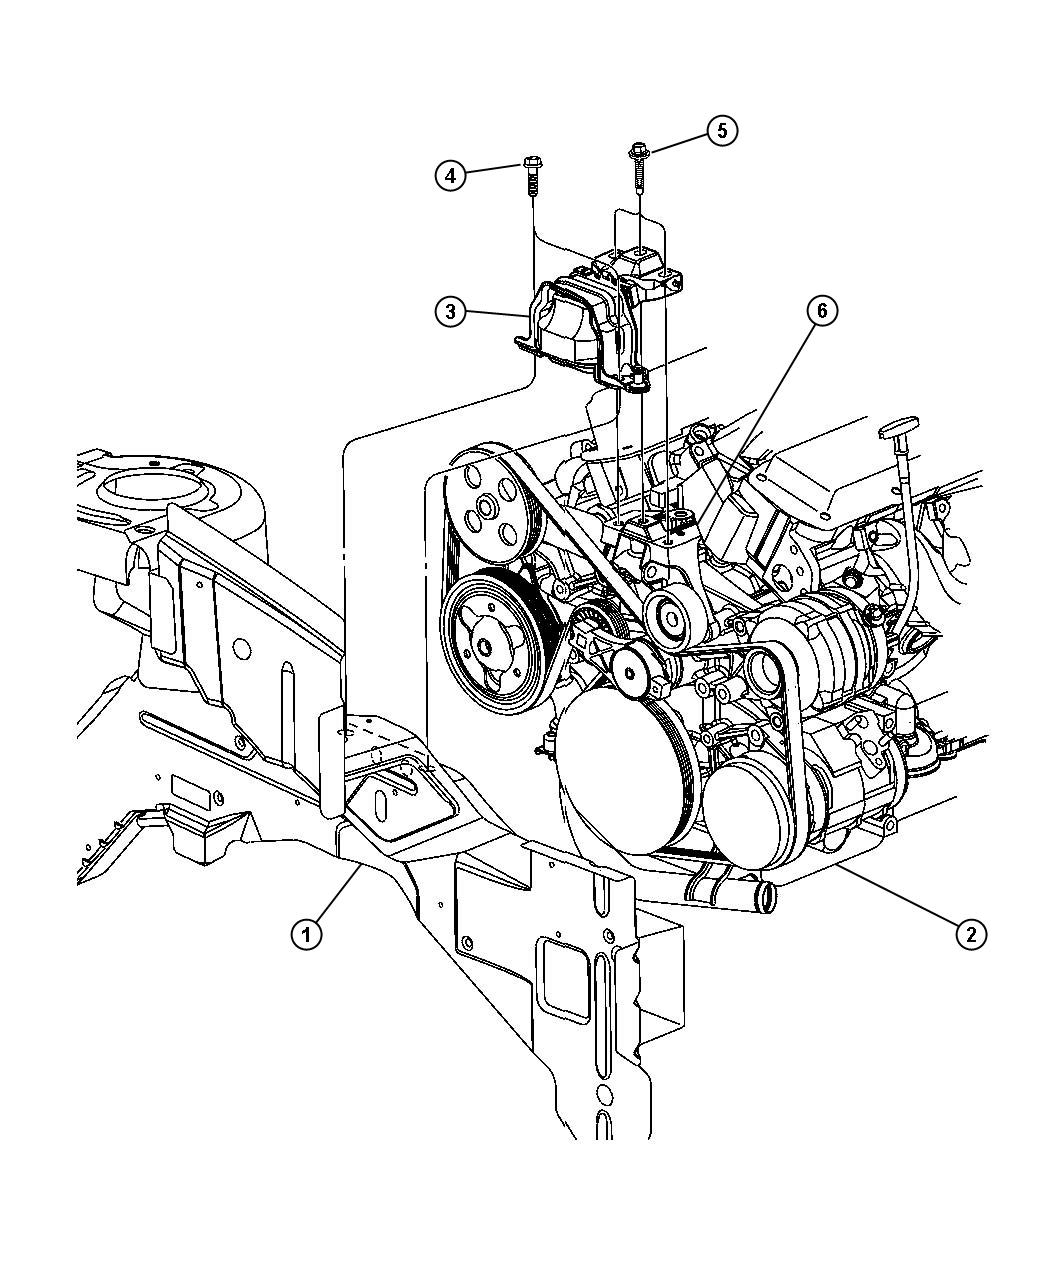 Dodge Ram Support Engine Mount Chain Carpets